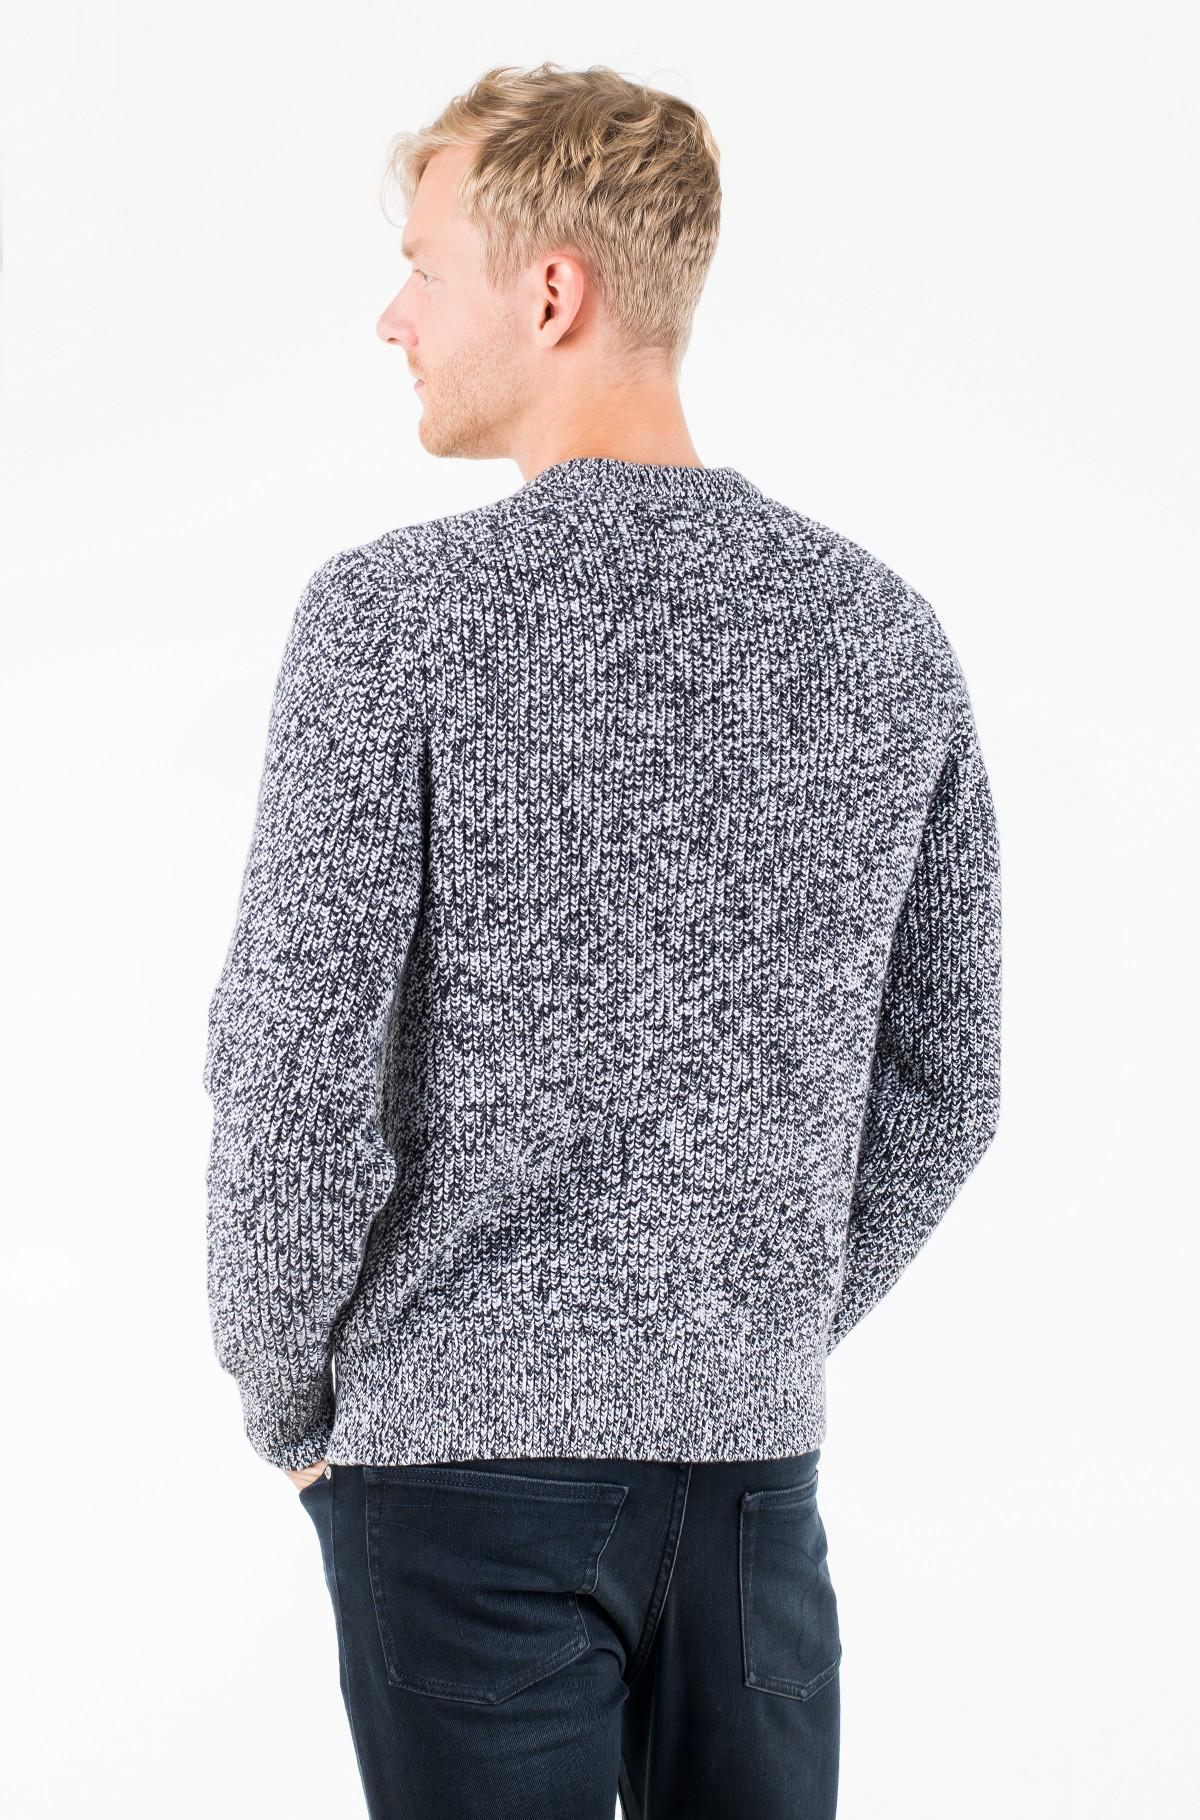 Sweater CARDIGAN STITCH CN SWEATER-full-2